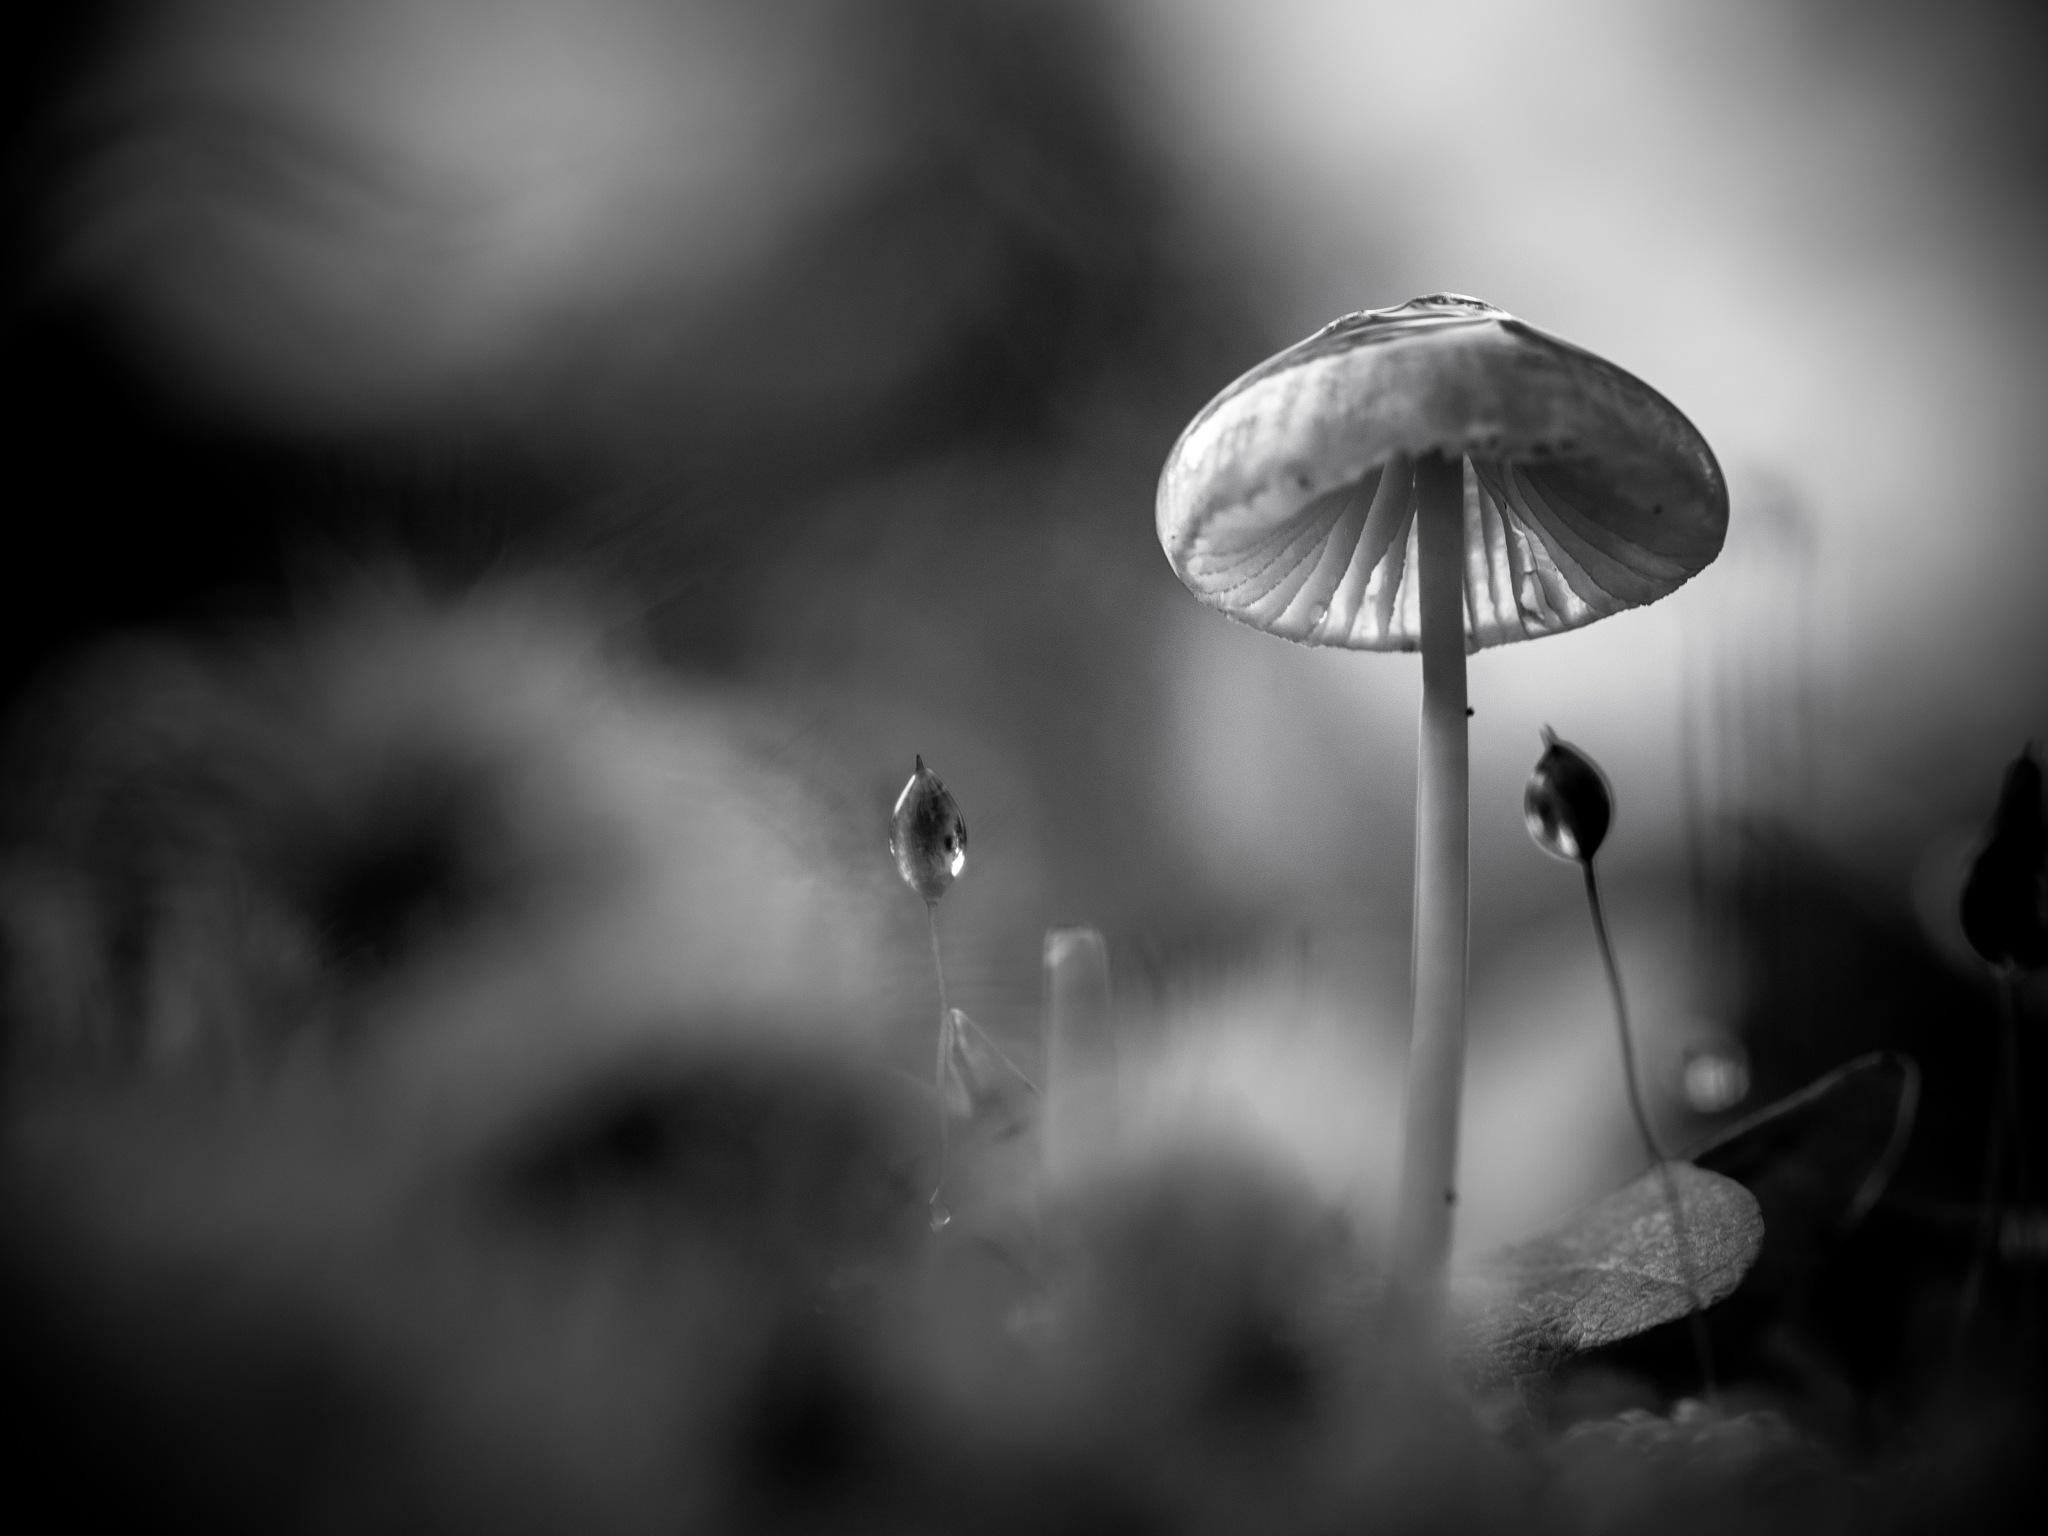 Mono fungi again by Sarah Walters